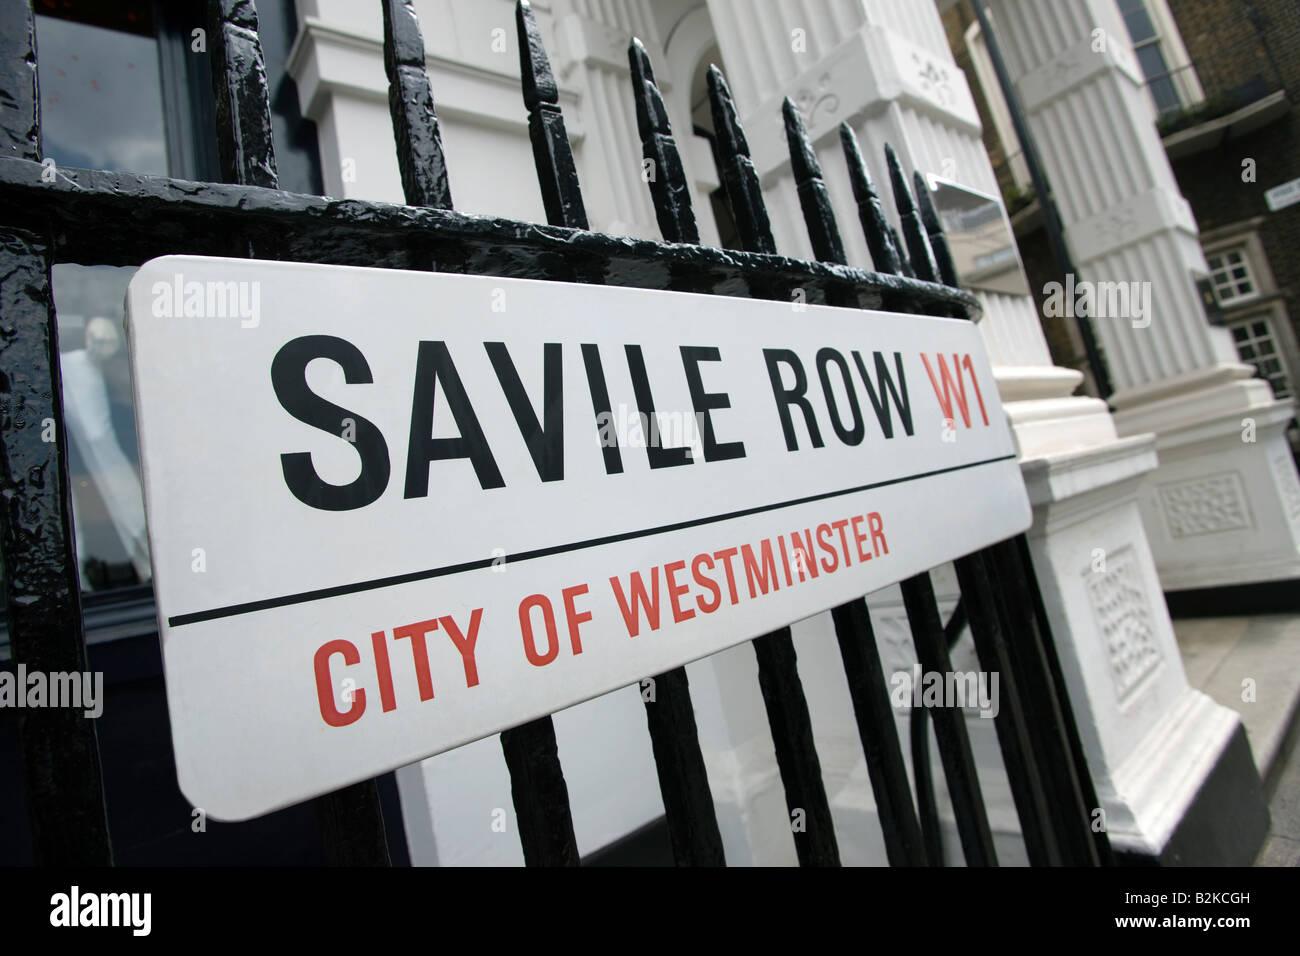 SAVILLE ROW  MAYFAIR LONDON ENGLAND UK - Stock Image